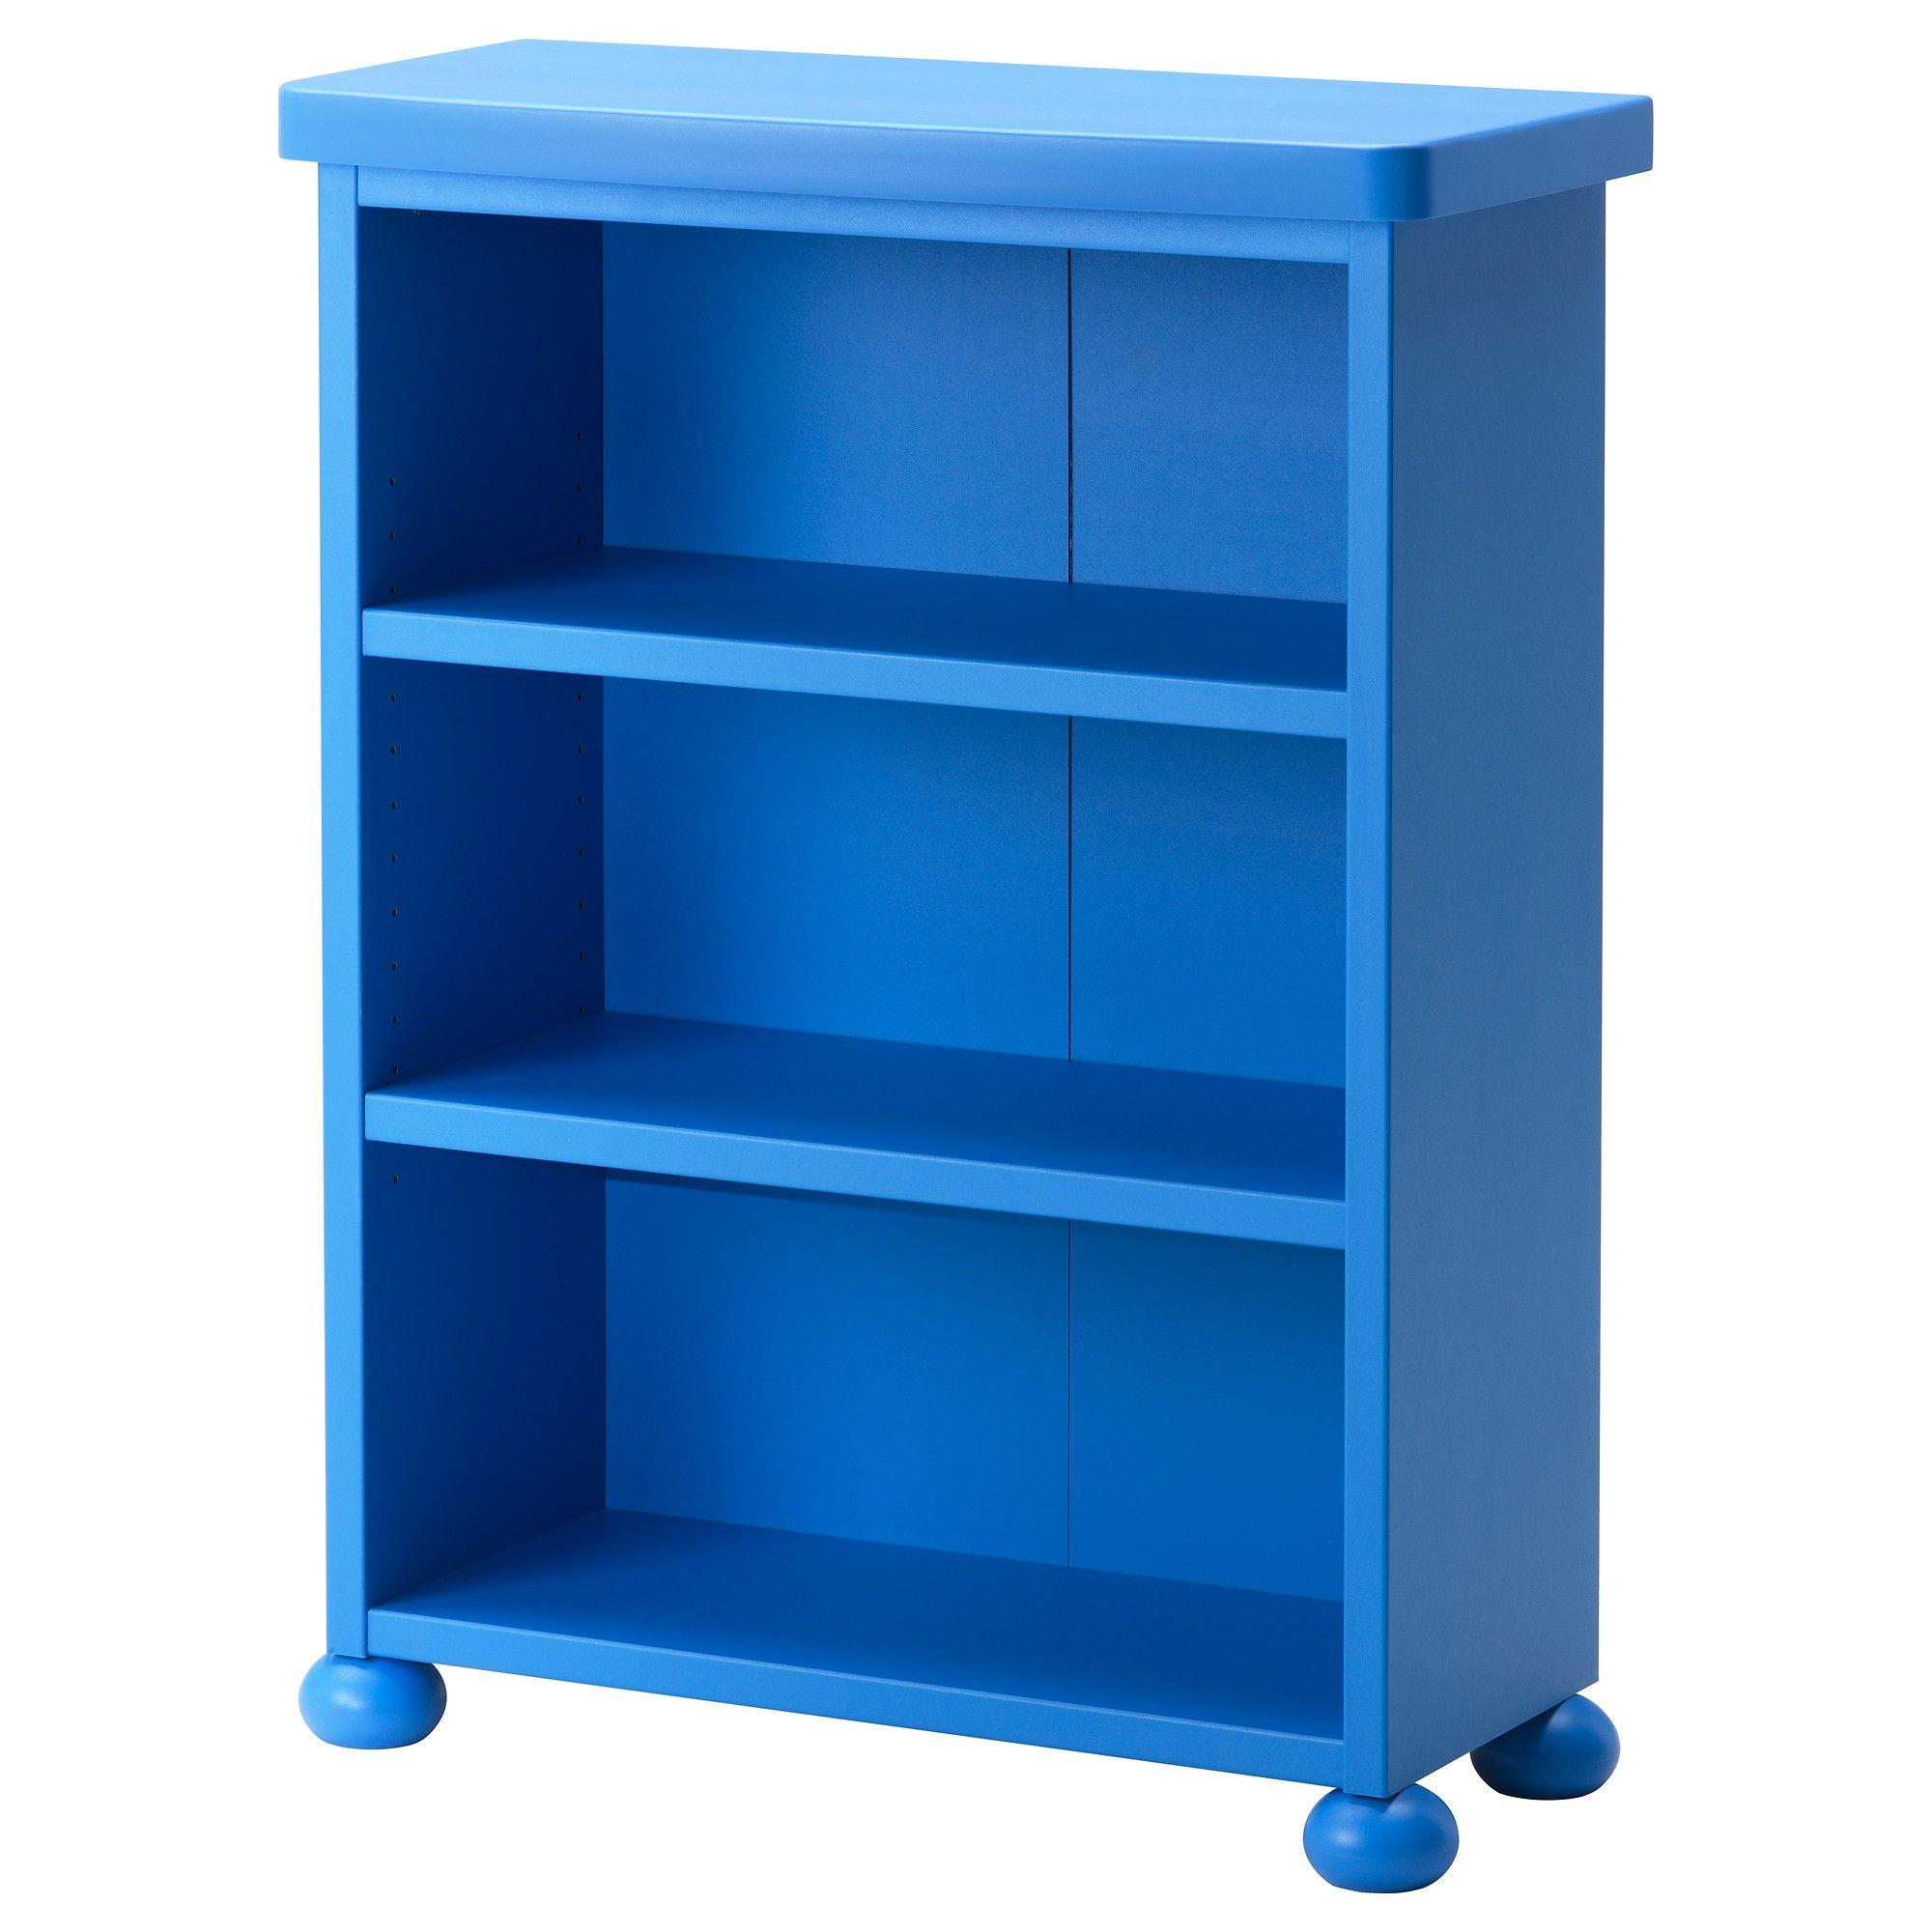 Australia Childrens storage furniture, Ikea storage